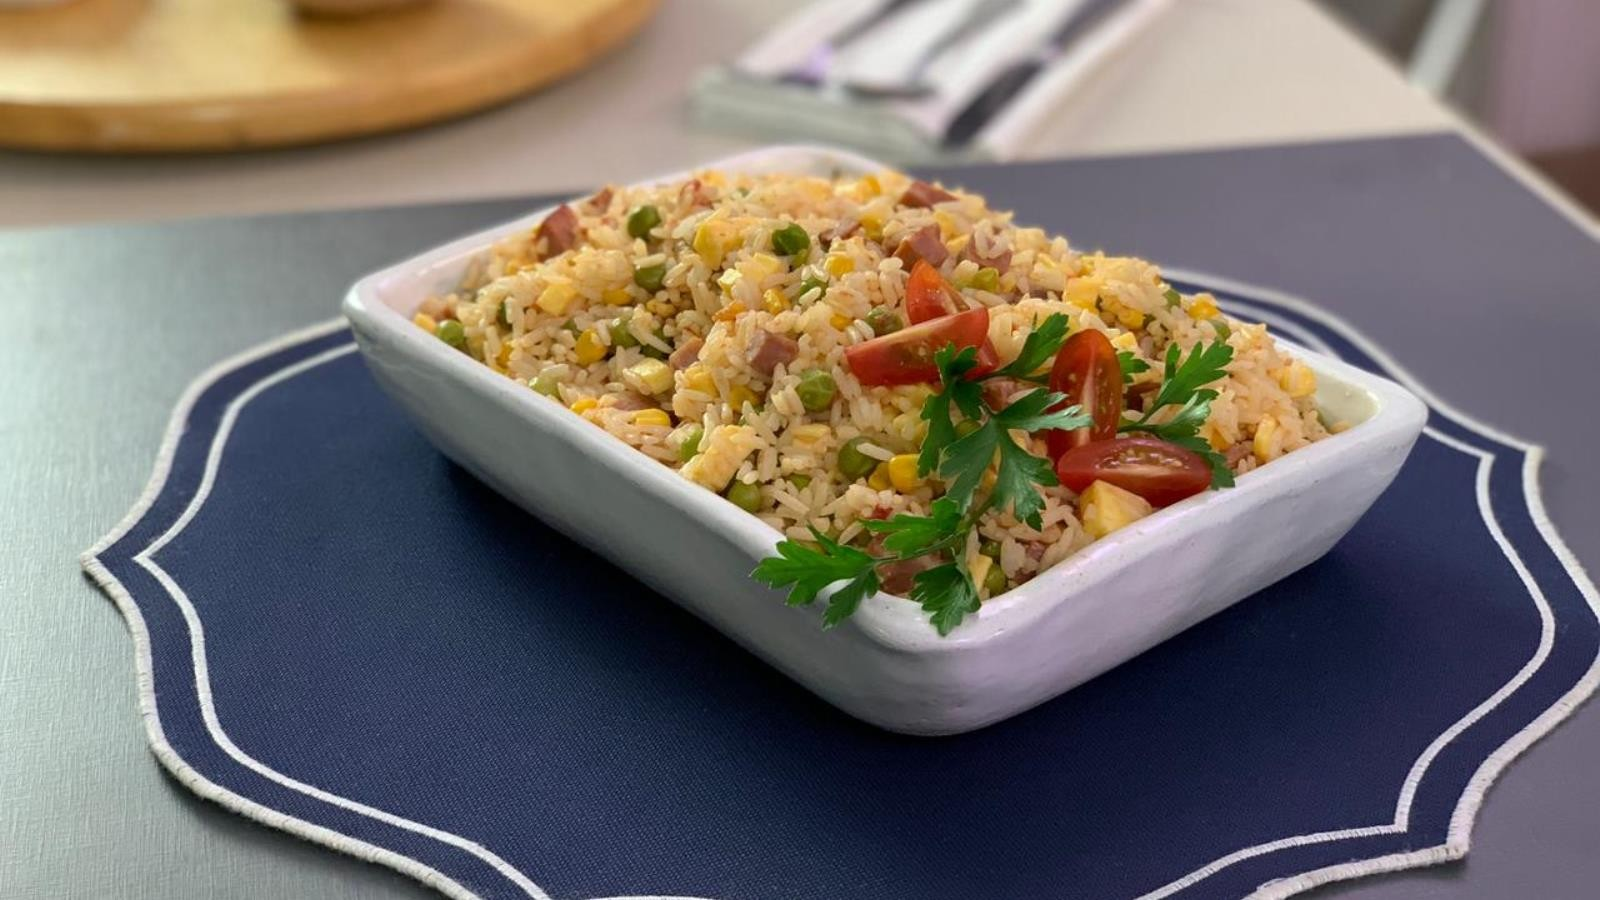 Arroz de forno é o primeiro prato do concurso Tá Combinado